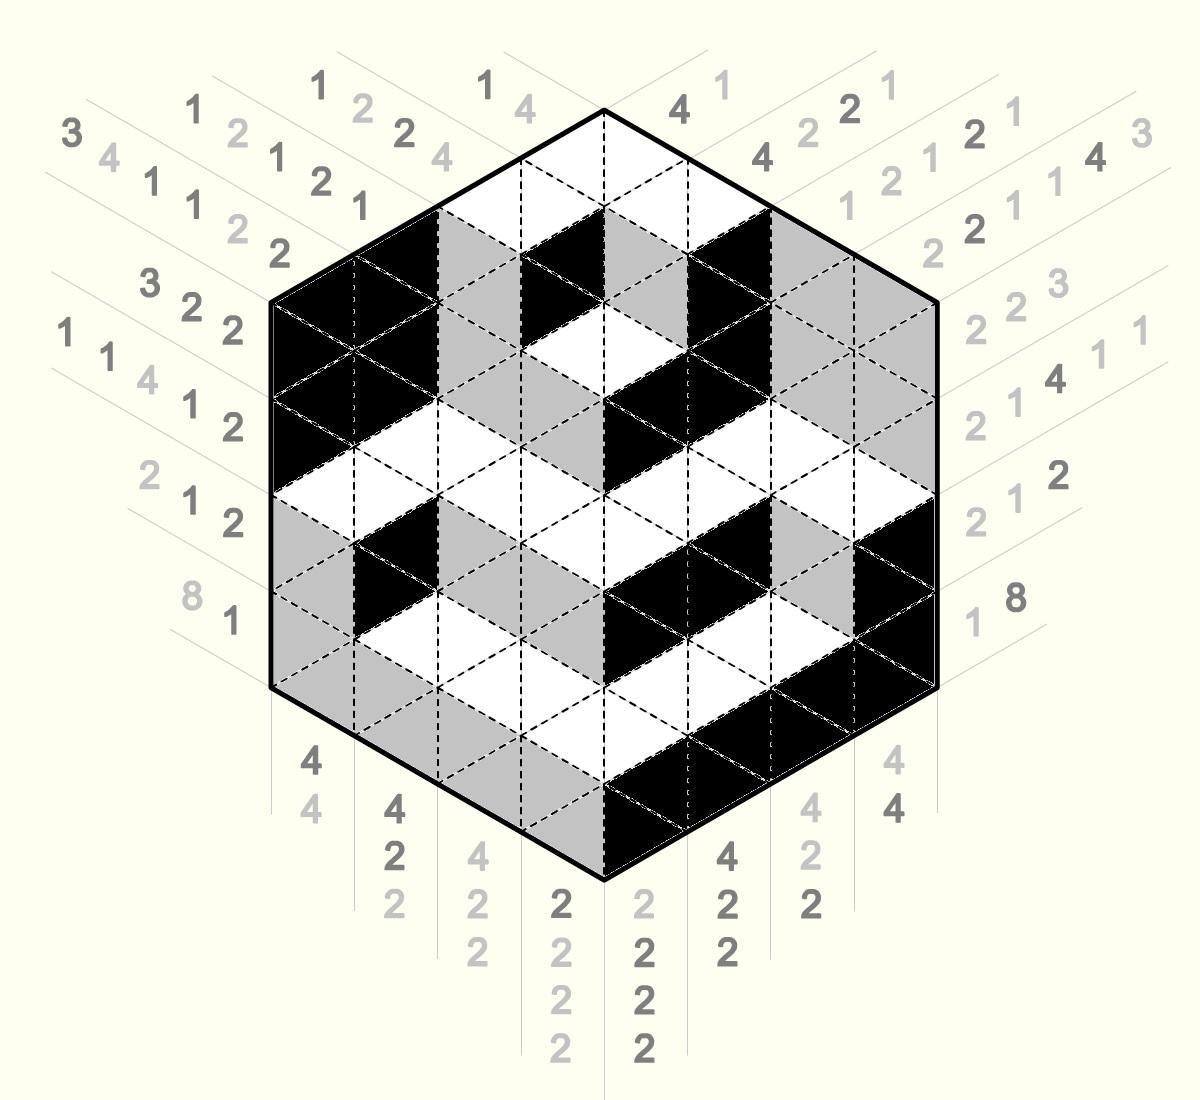 http://www.prise2tete.fr/upload/Papy04-PixFritz.jpg